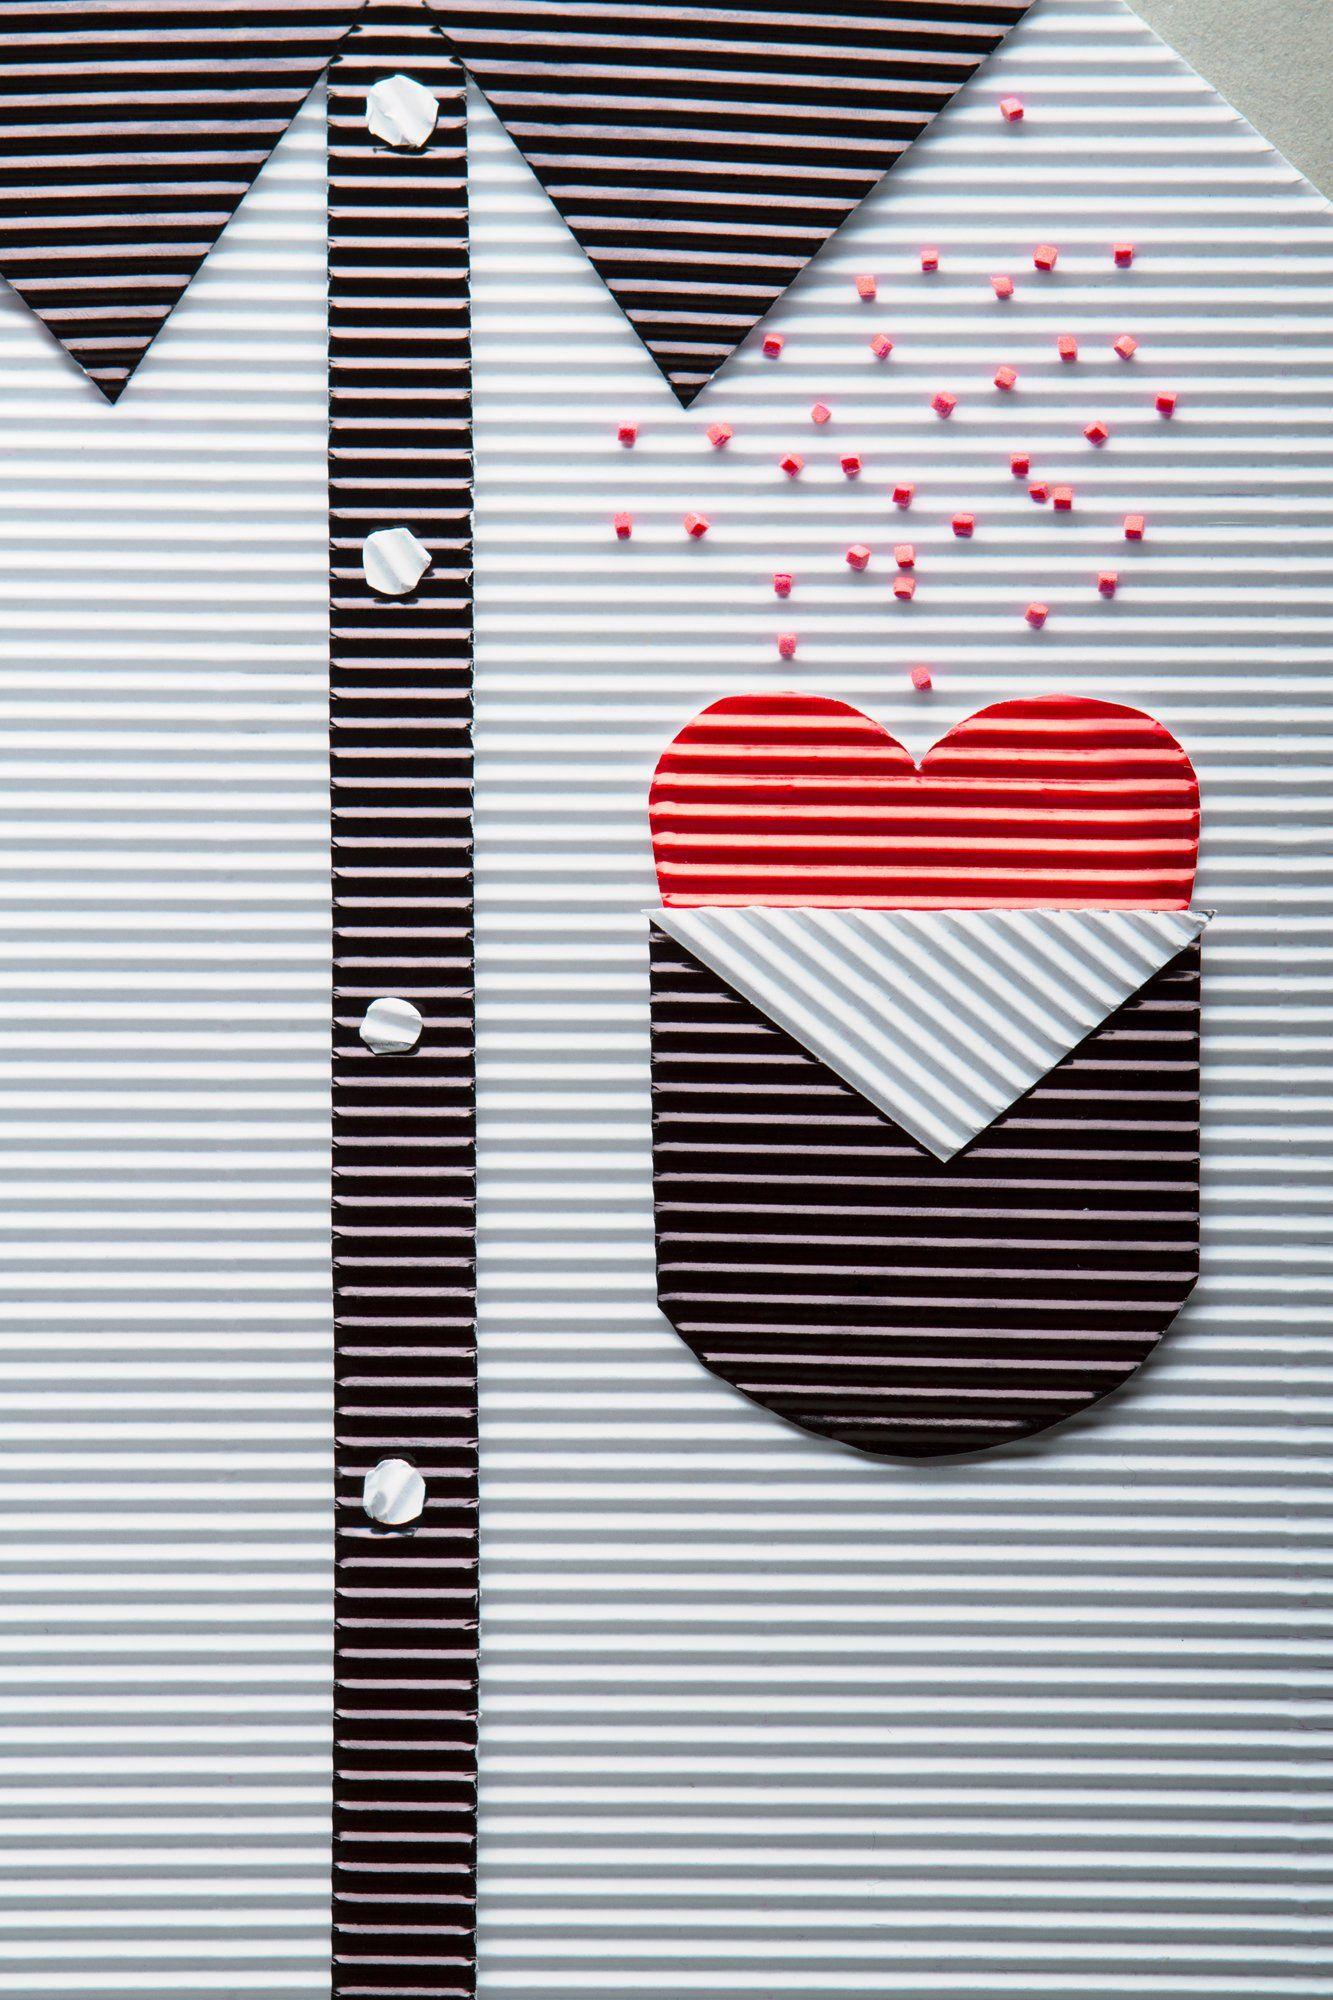 бумага, сердце, валентинка, рубашка,, Наталья Голубева